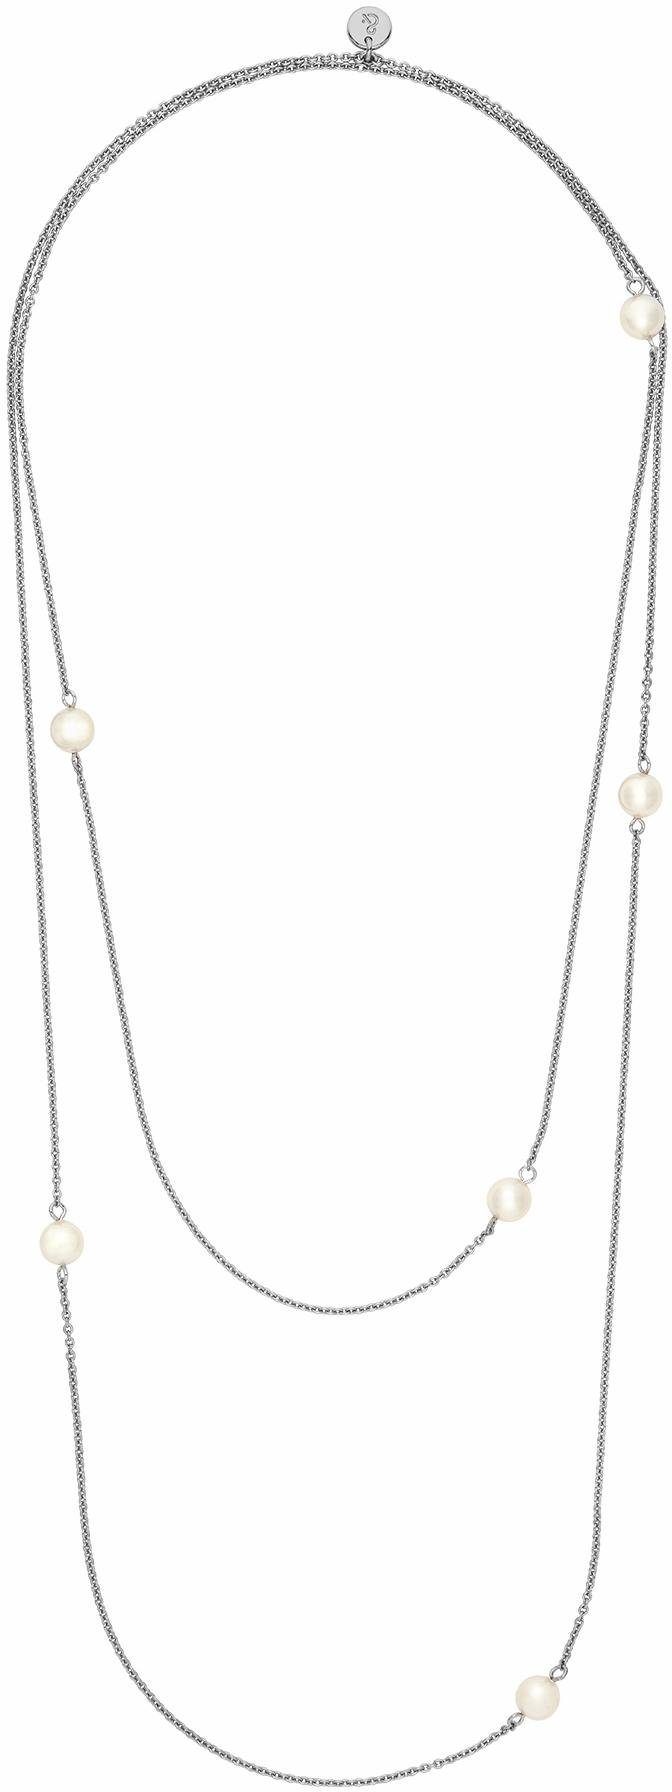 Lolaandgrace Perlenkette »OCEAN CHAIN SAUTOIR, 5251995«, mit Swarovski® Perle